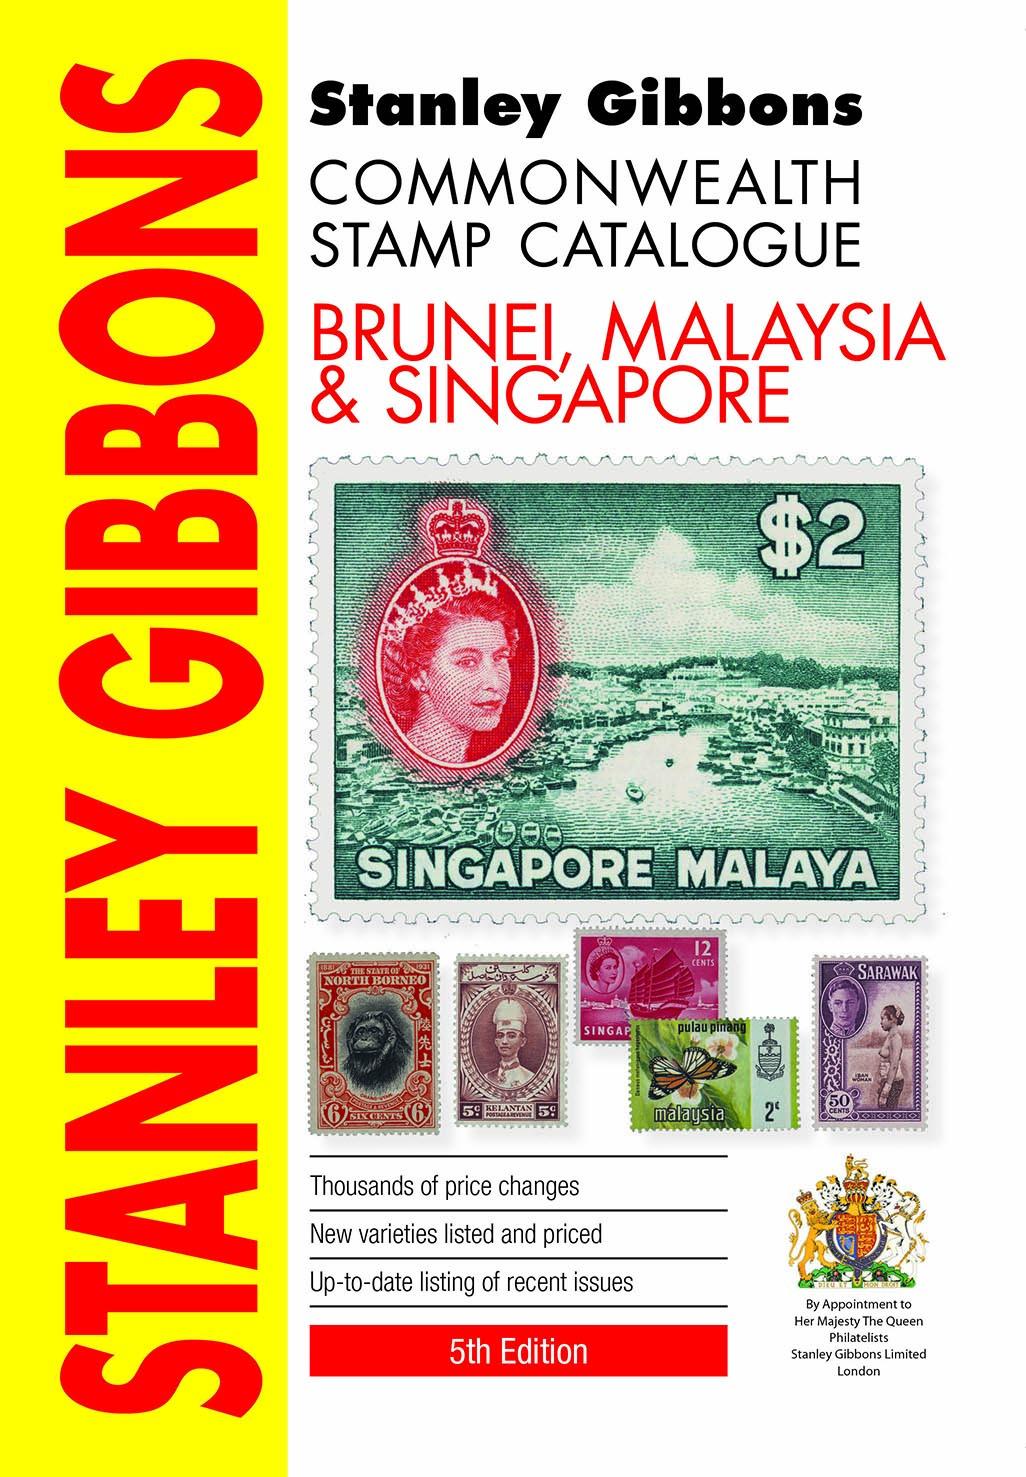 Brunei, Malaysia & Singapore Stamp Catalogue 5th Edition